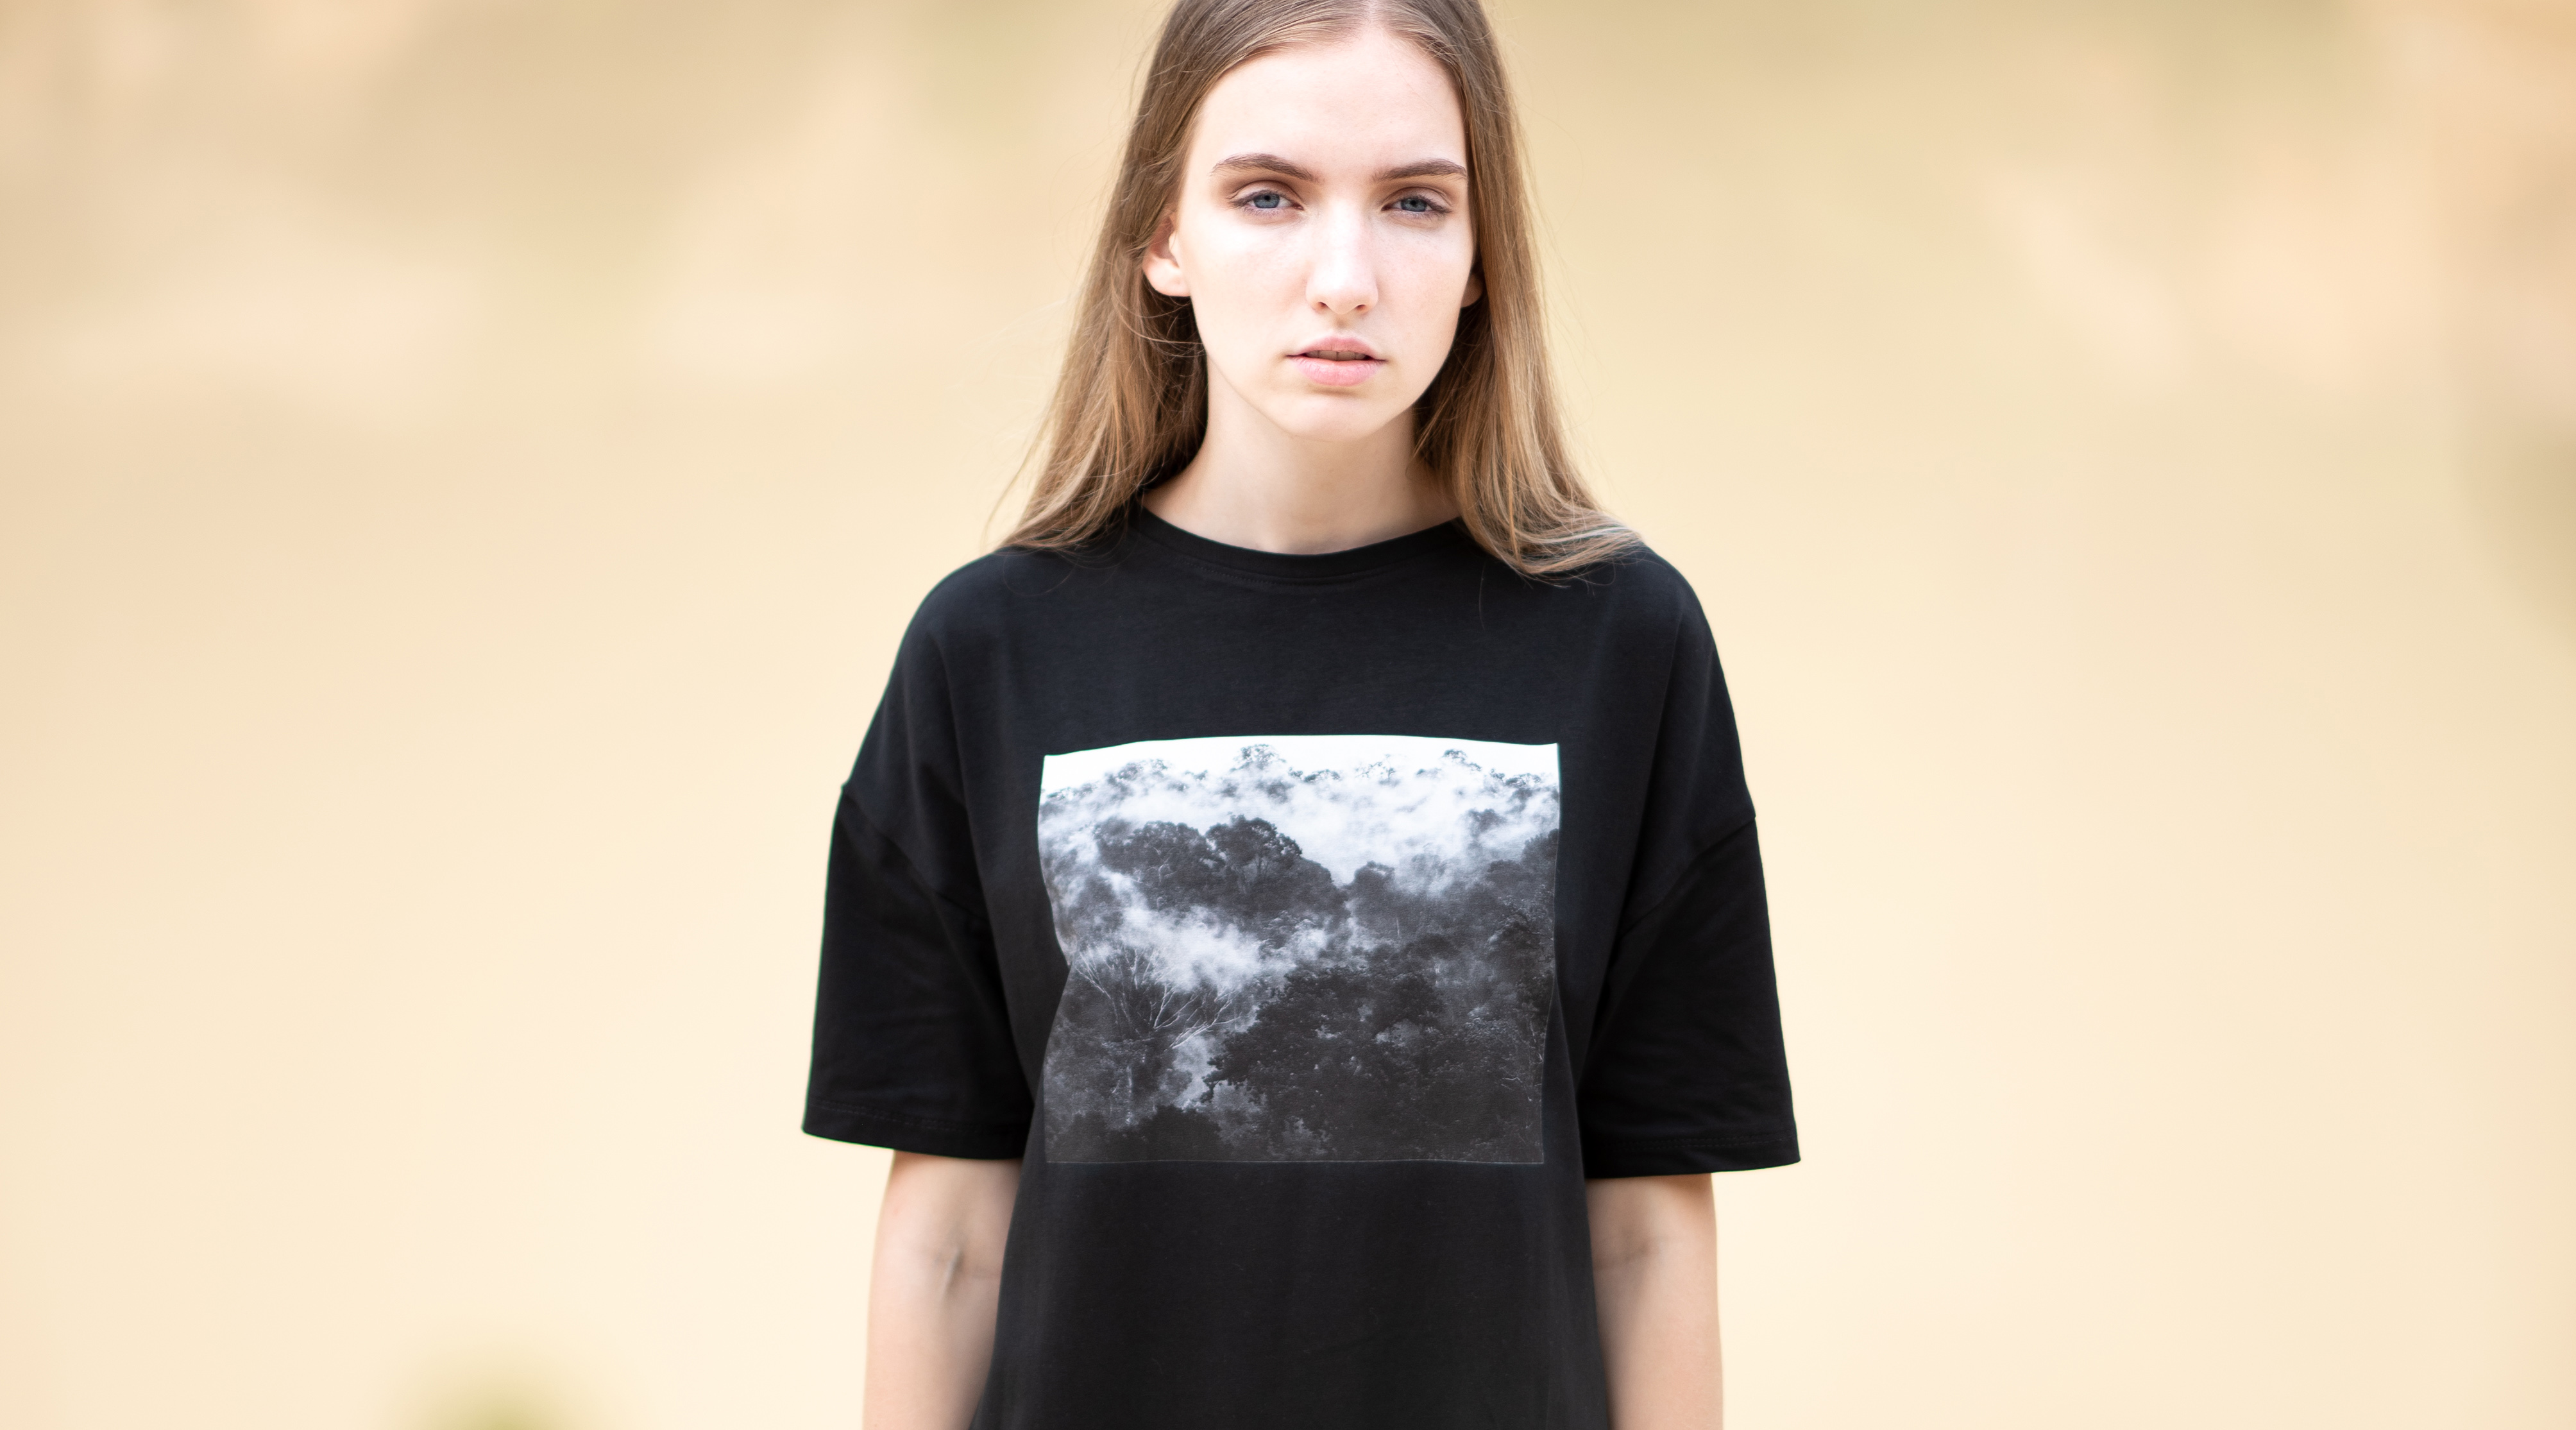 Kousek pralesa tričkošaty